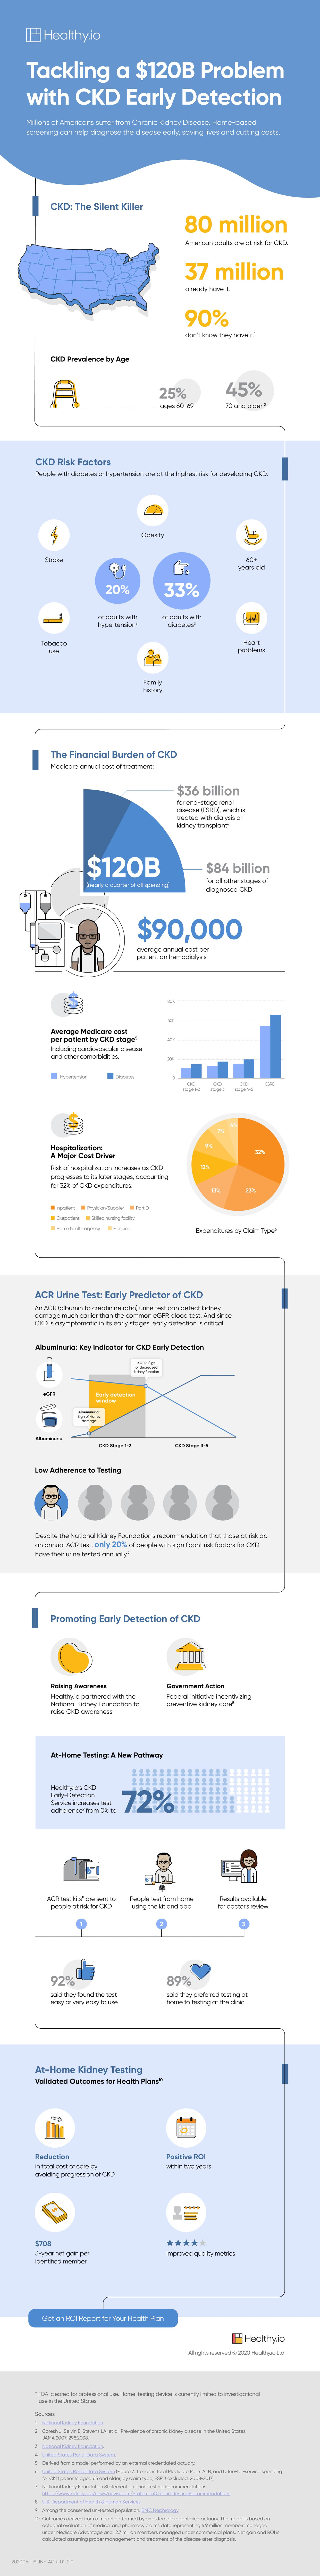 CKD Infographic